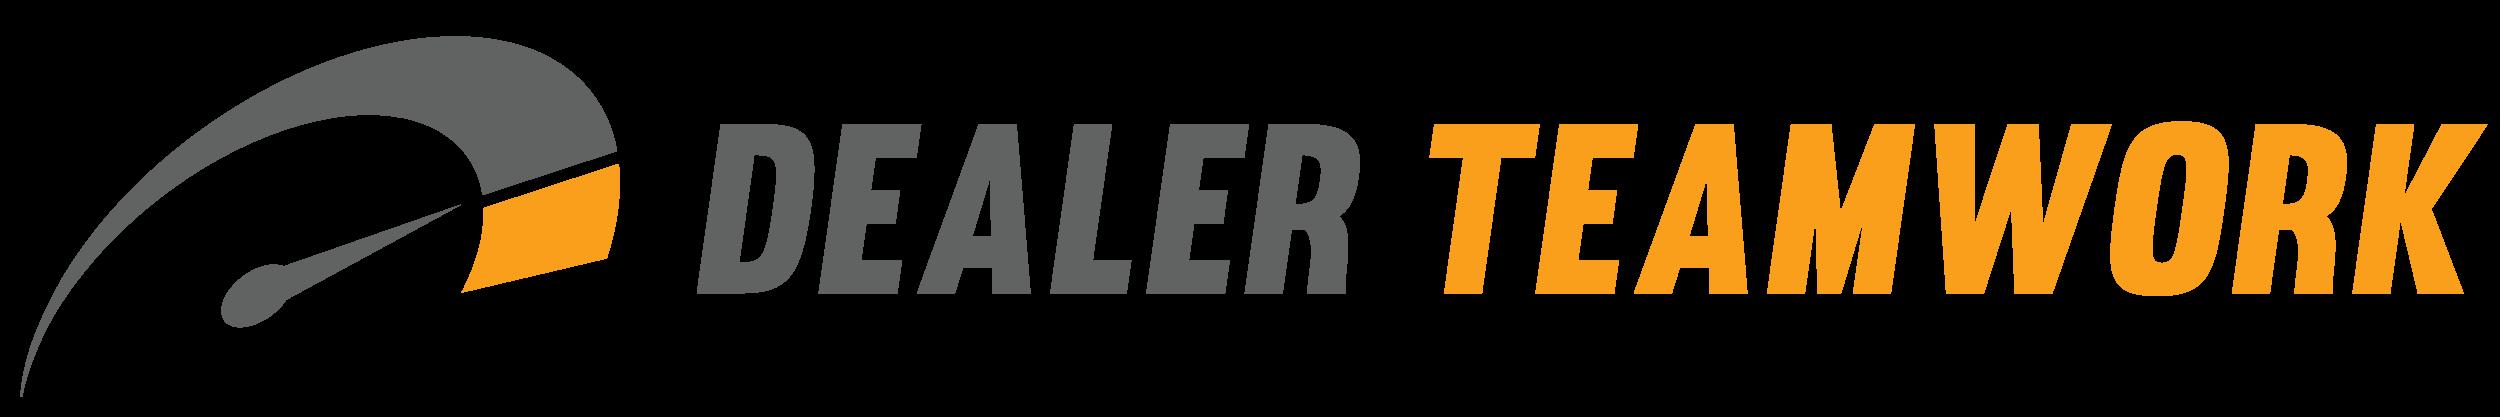 DealerTeamwork LLC